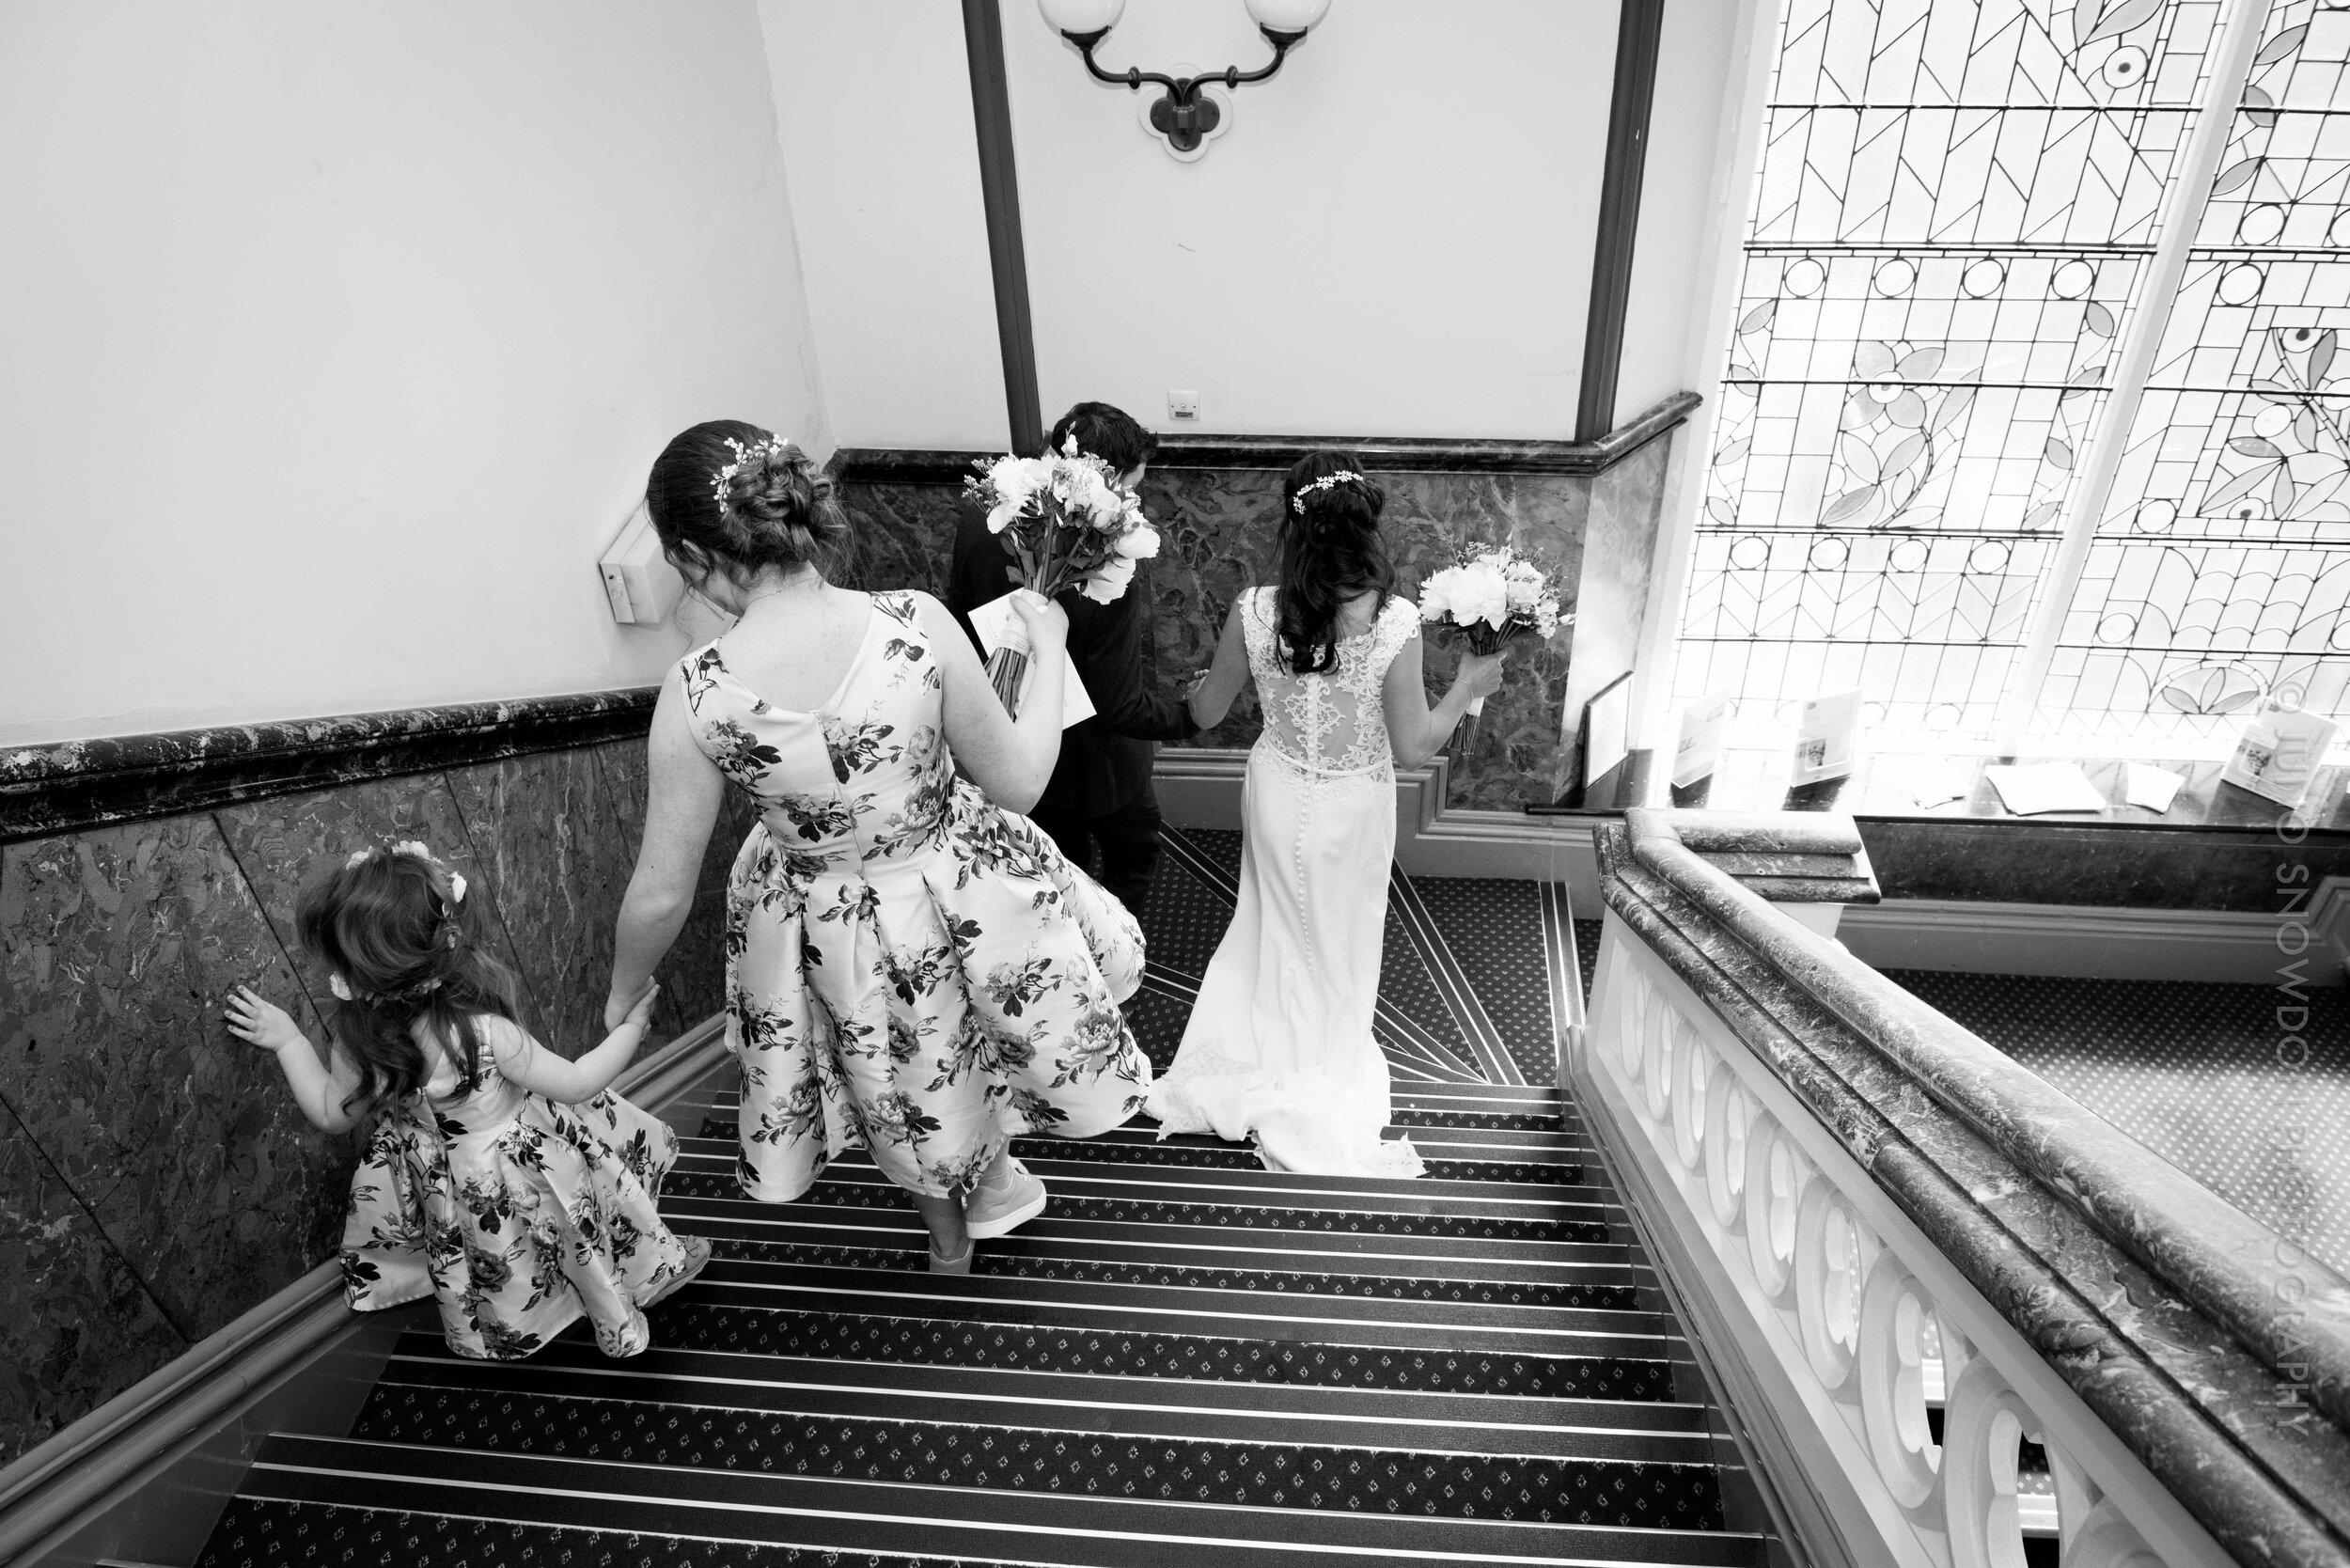 juno-snowdon-photography-wedding-7362.jpg